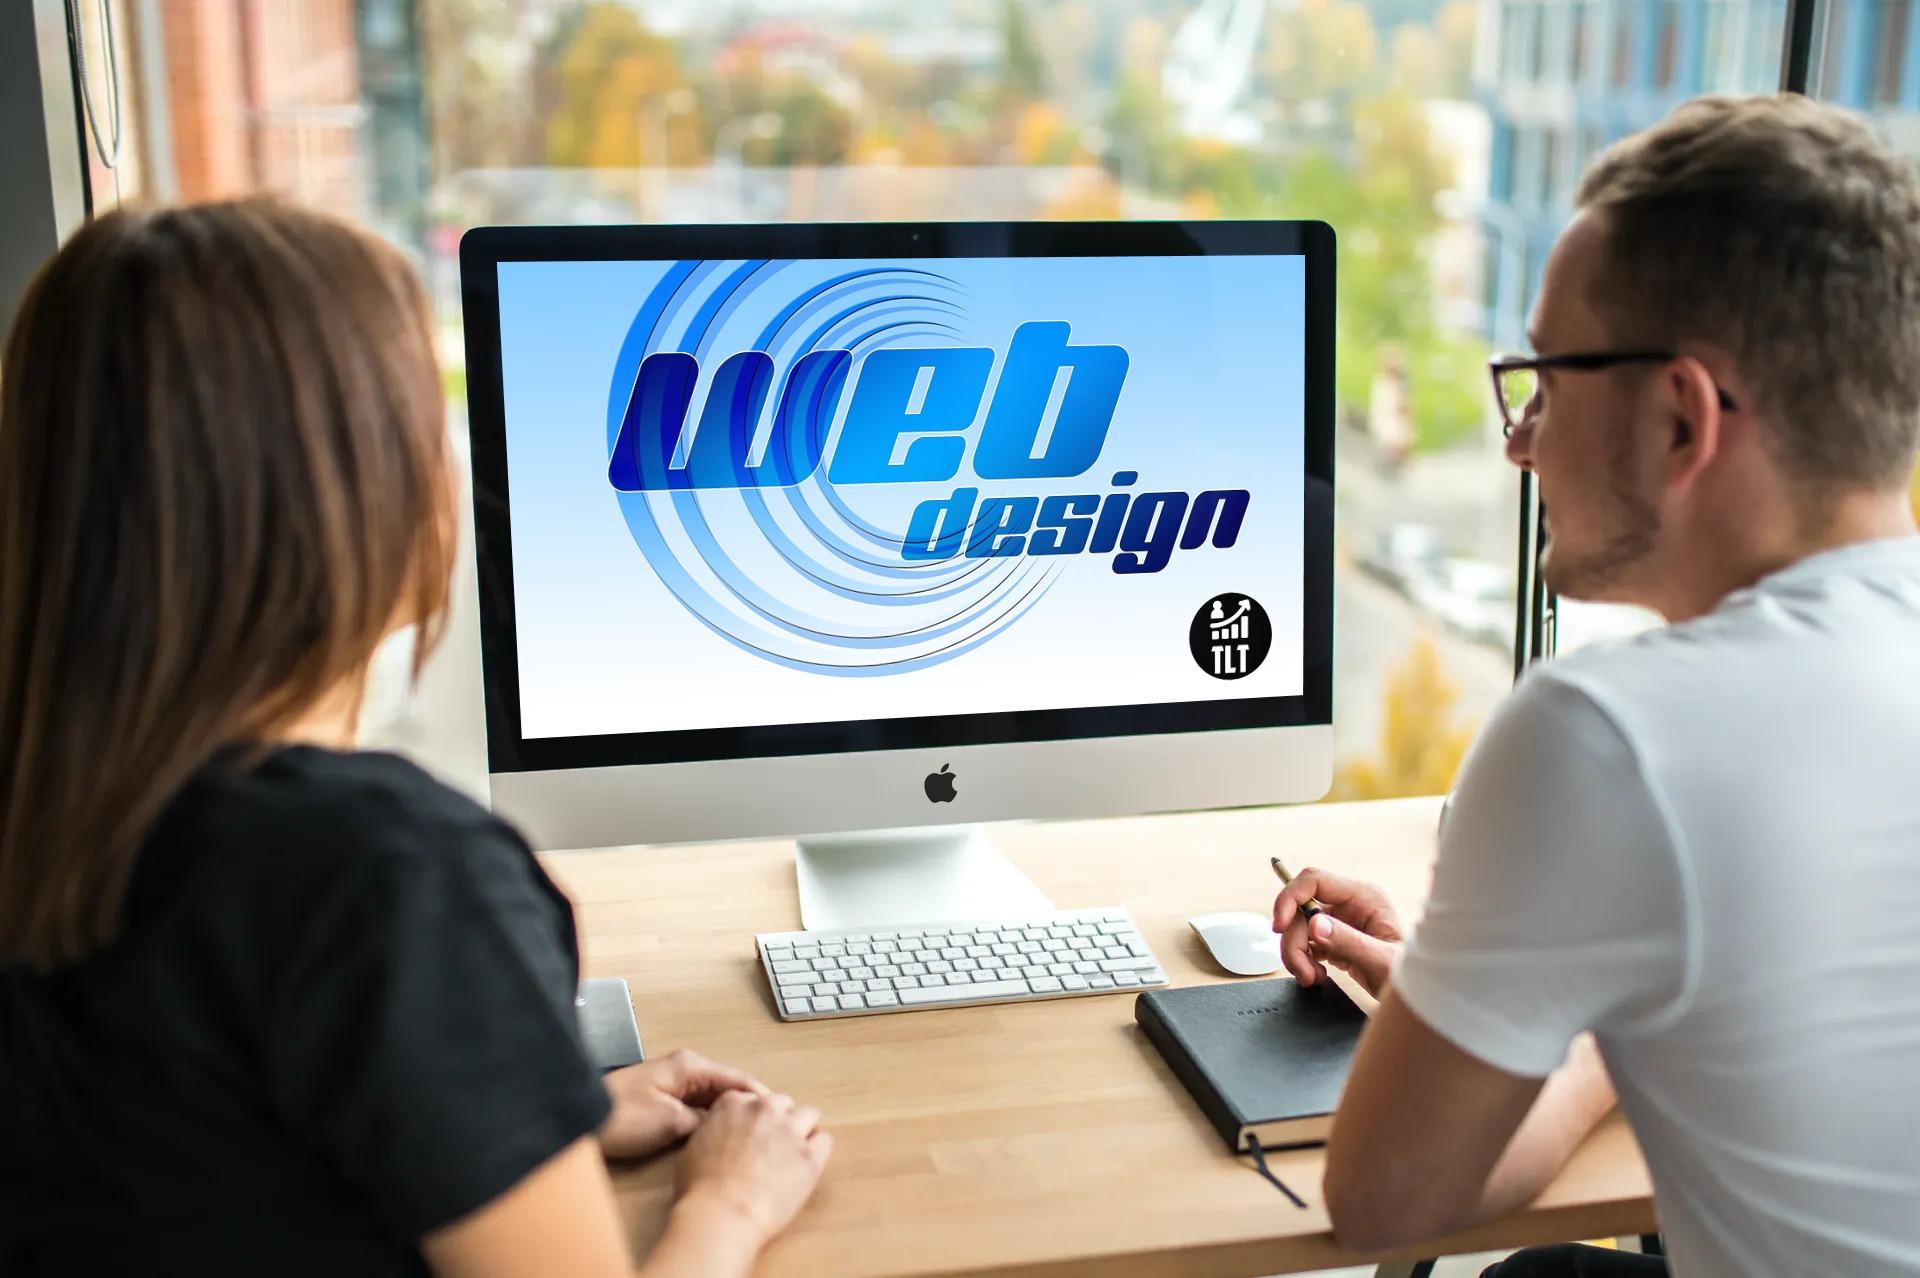 Web Design Firm Top Traffic